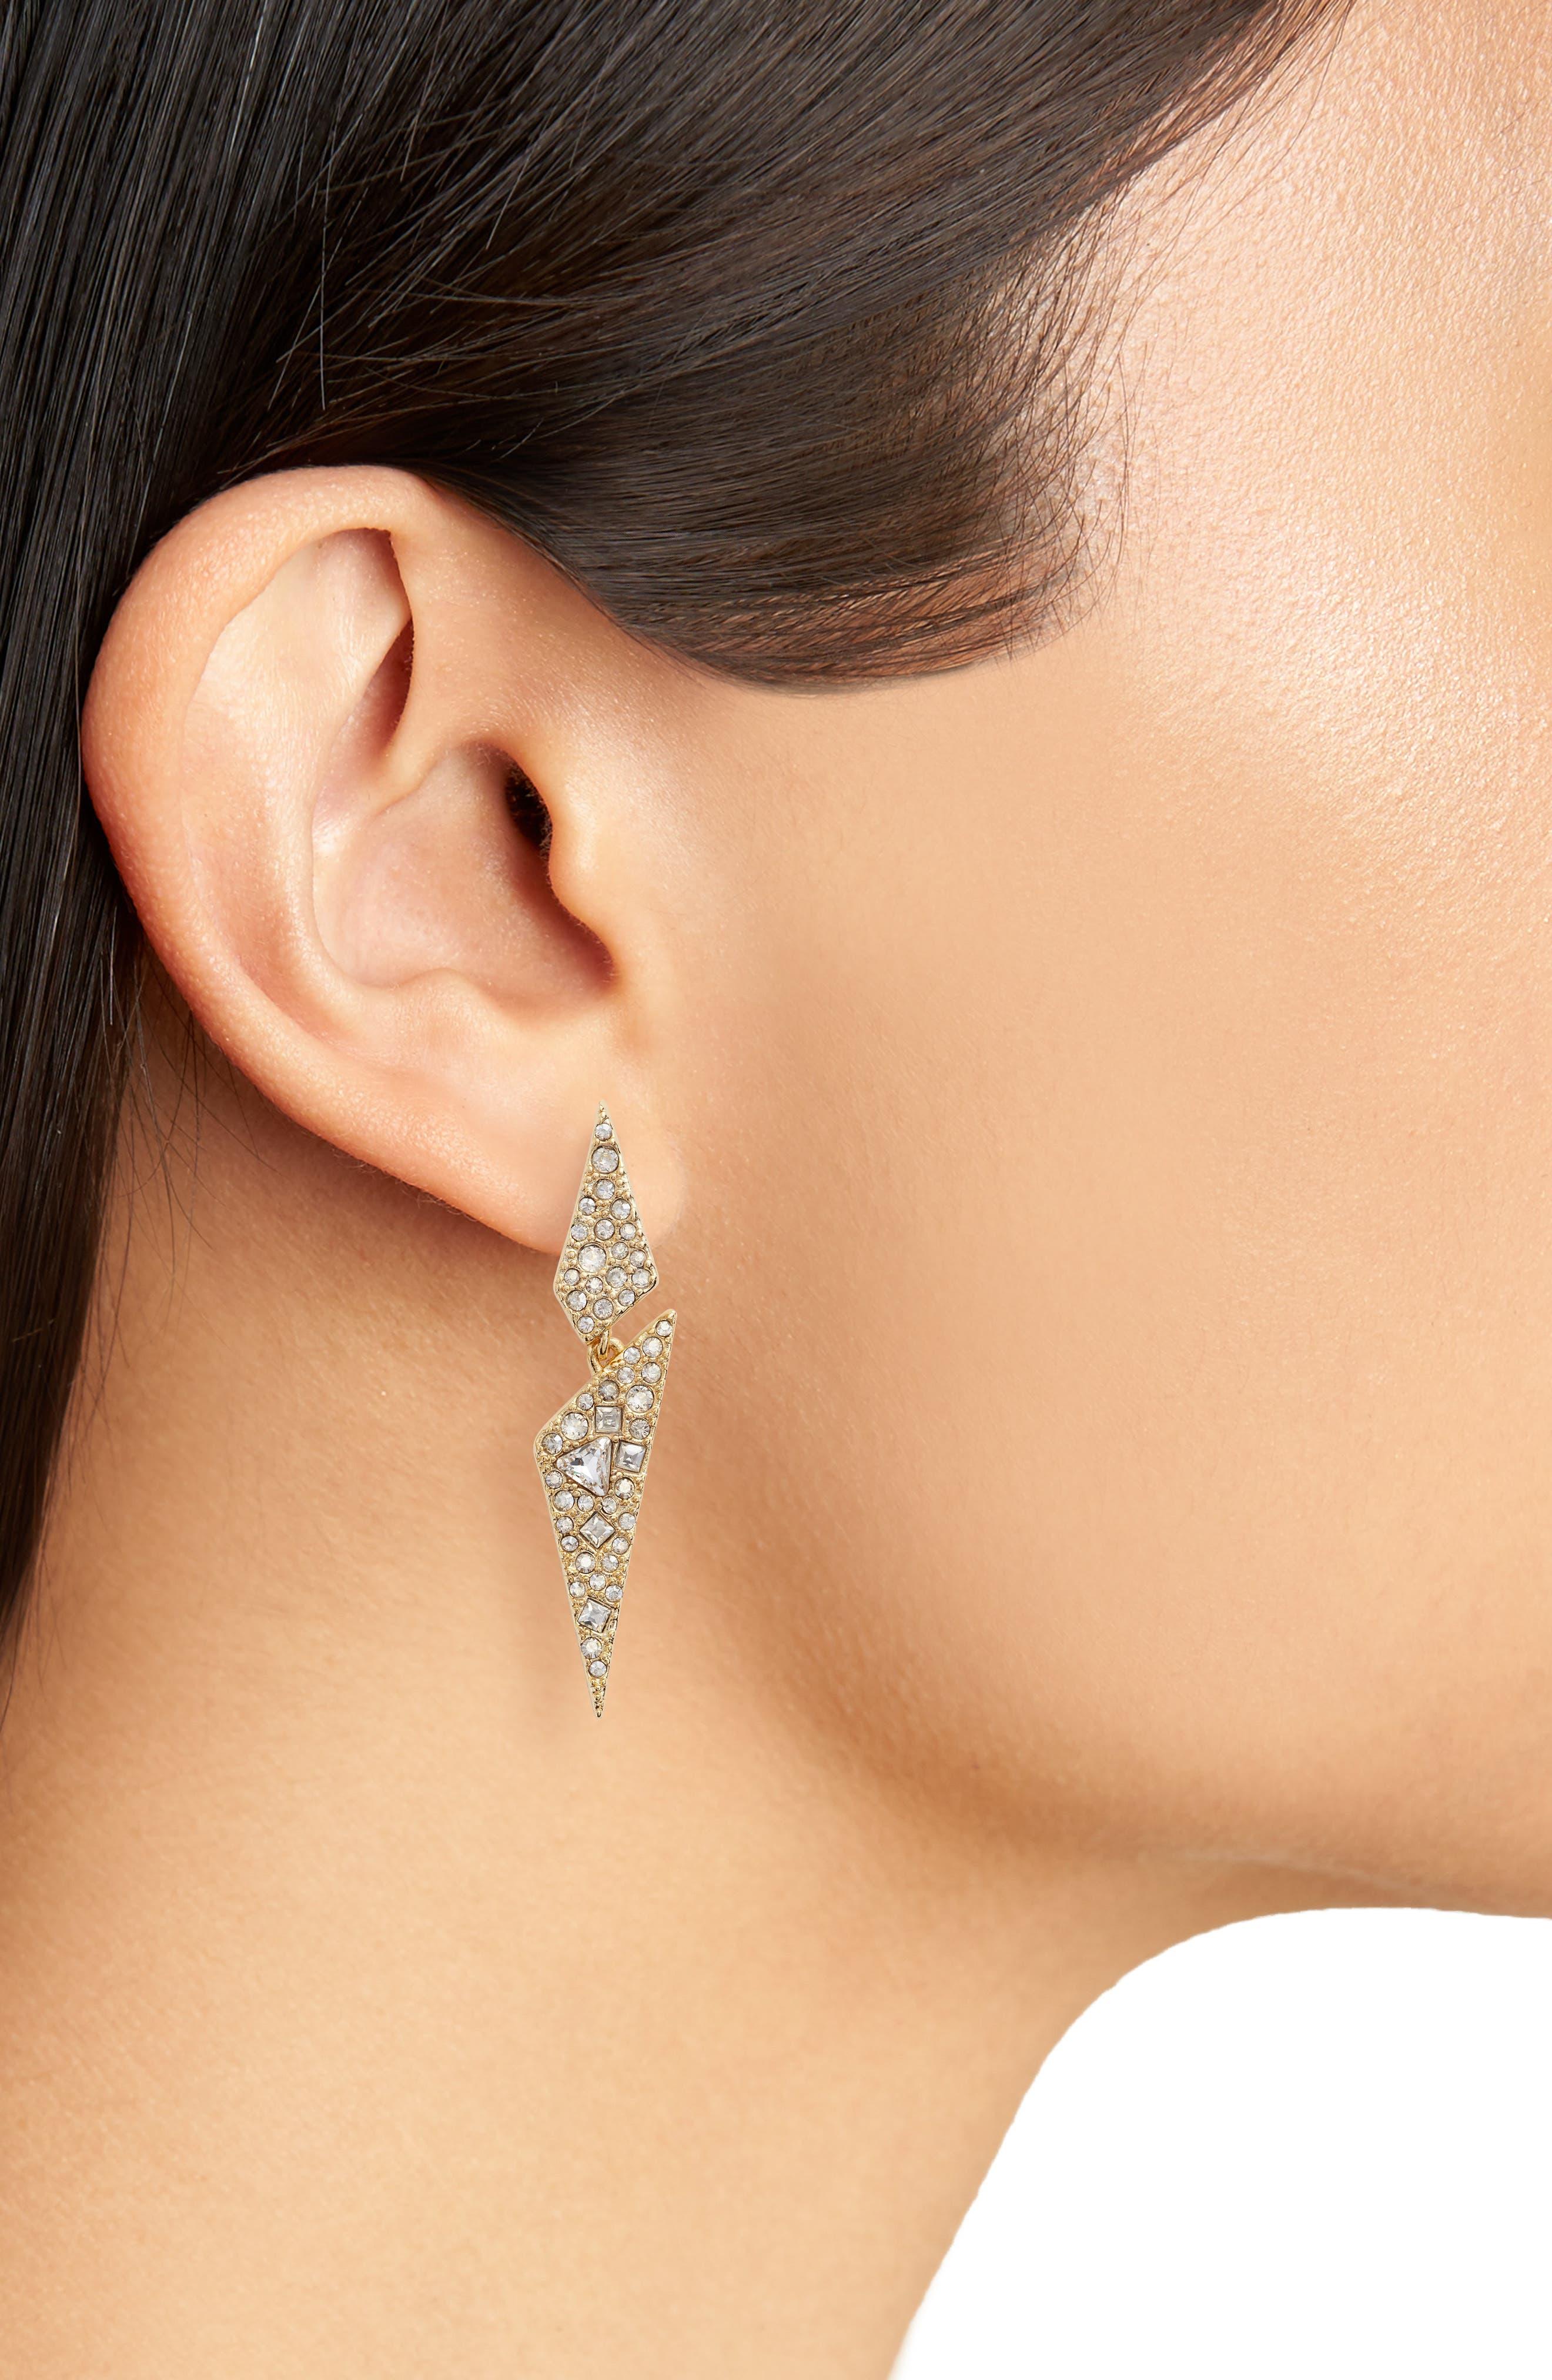 Crystal Encrusted Dangling Drop Earrings,                             Alternate thumbnail 2, color,                             710